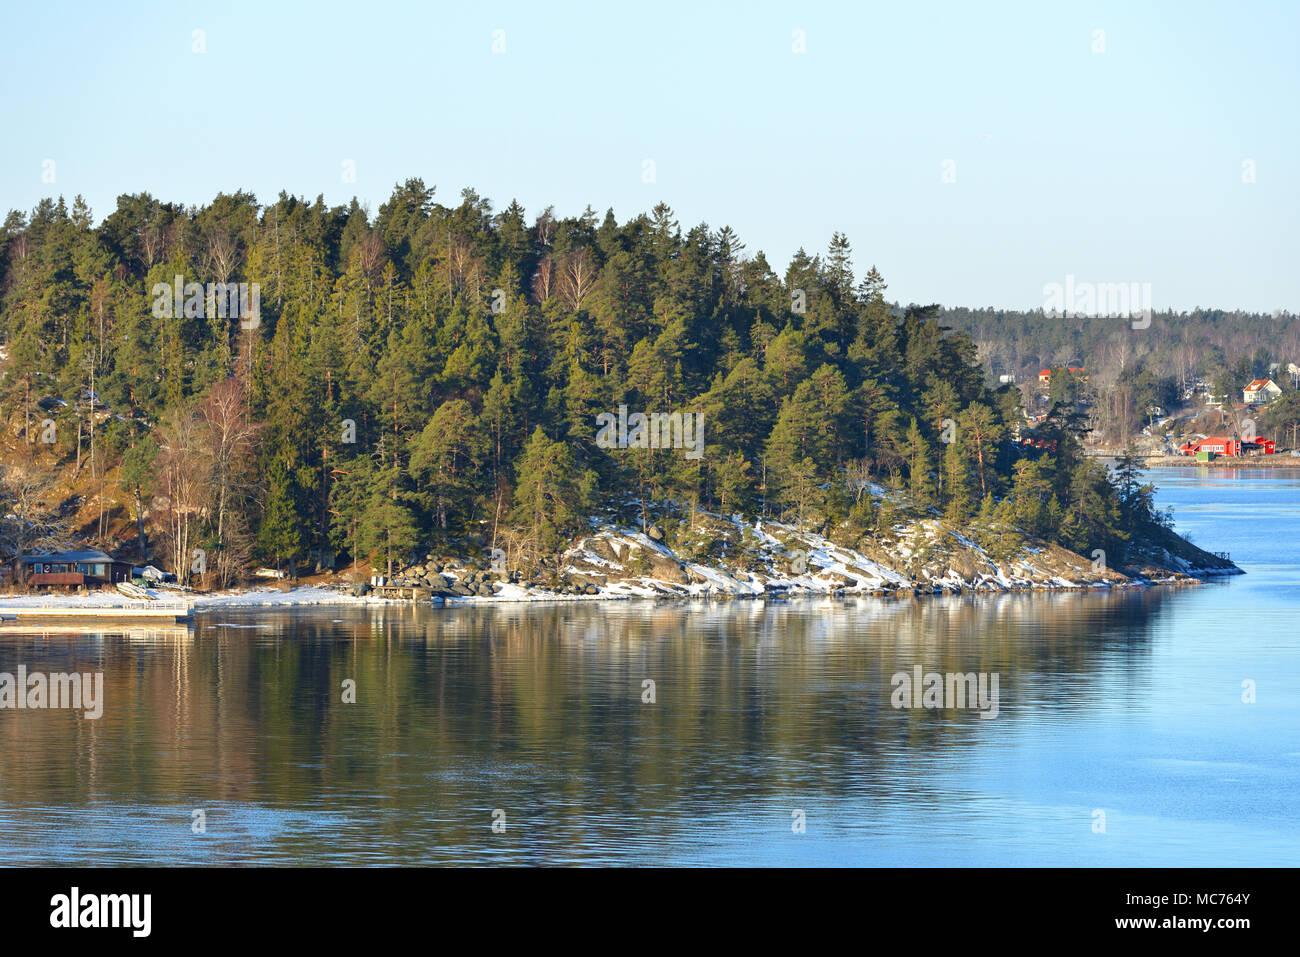 Stockholm archipelago, largest archipelago in Sweden, and second-largest archipelago in Baltic Sea. March - Stock Image